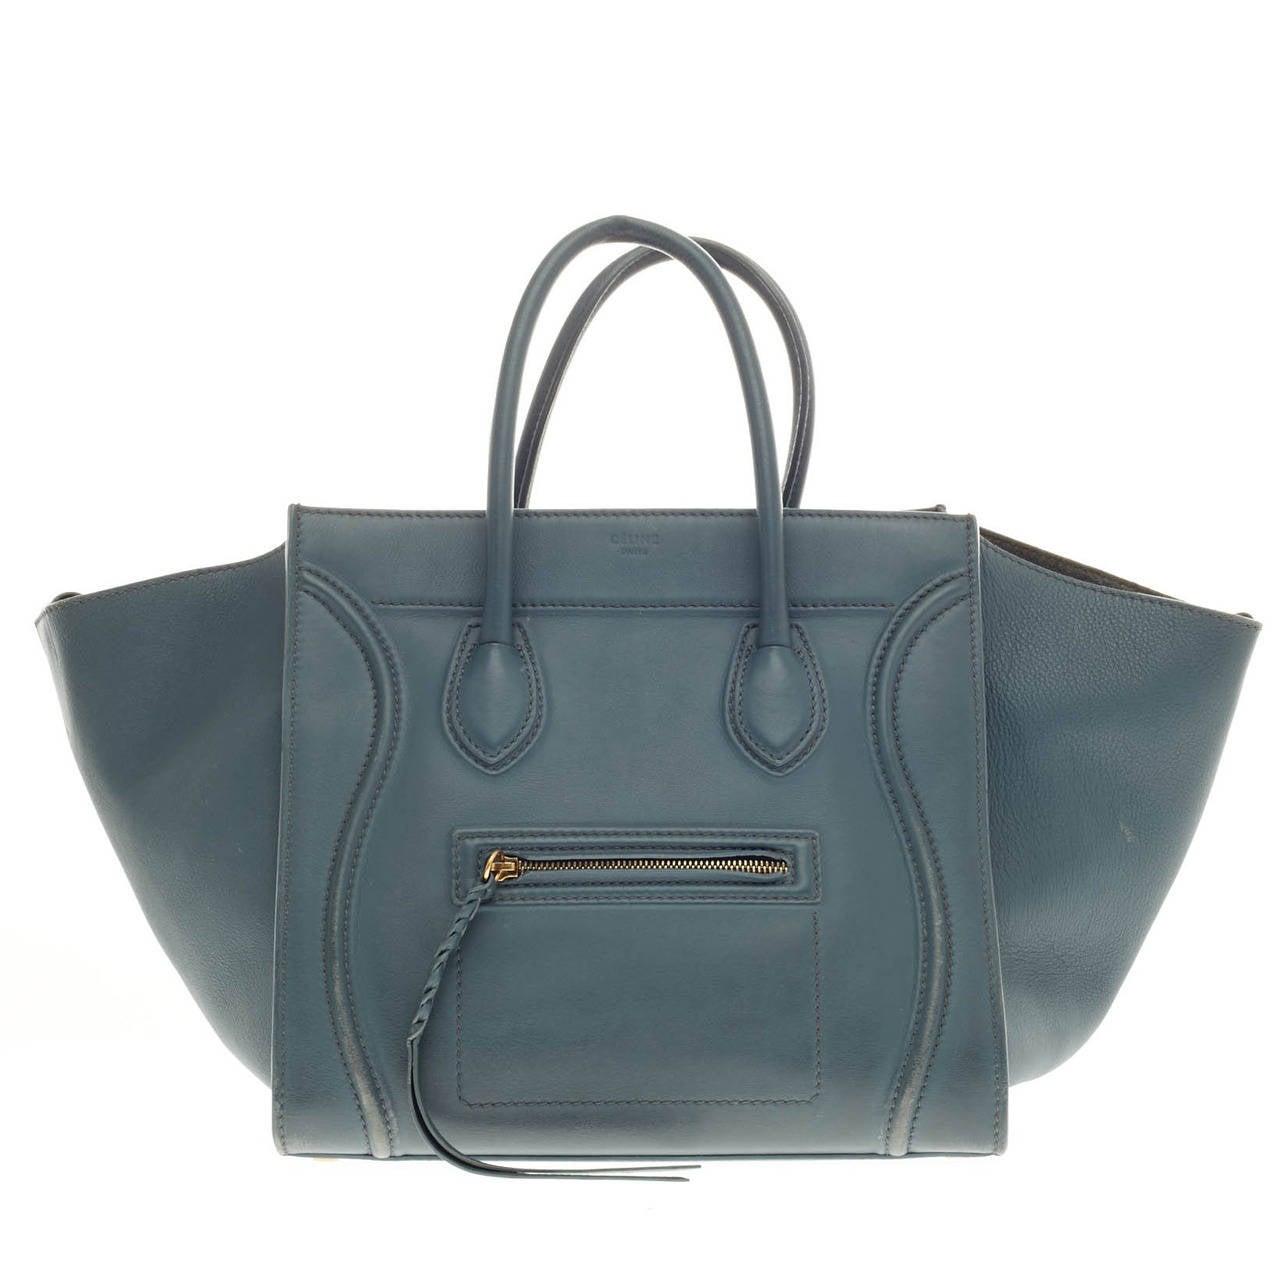 Celine Phantom Smooth Leather Large 1